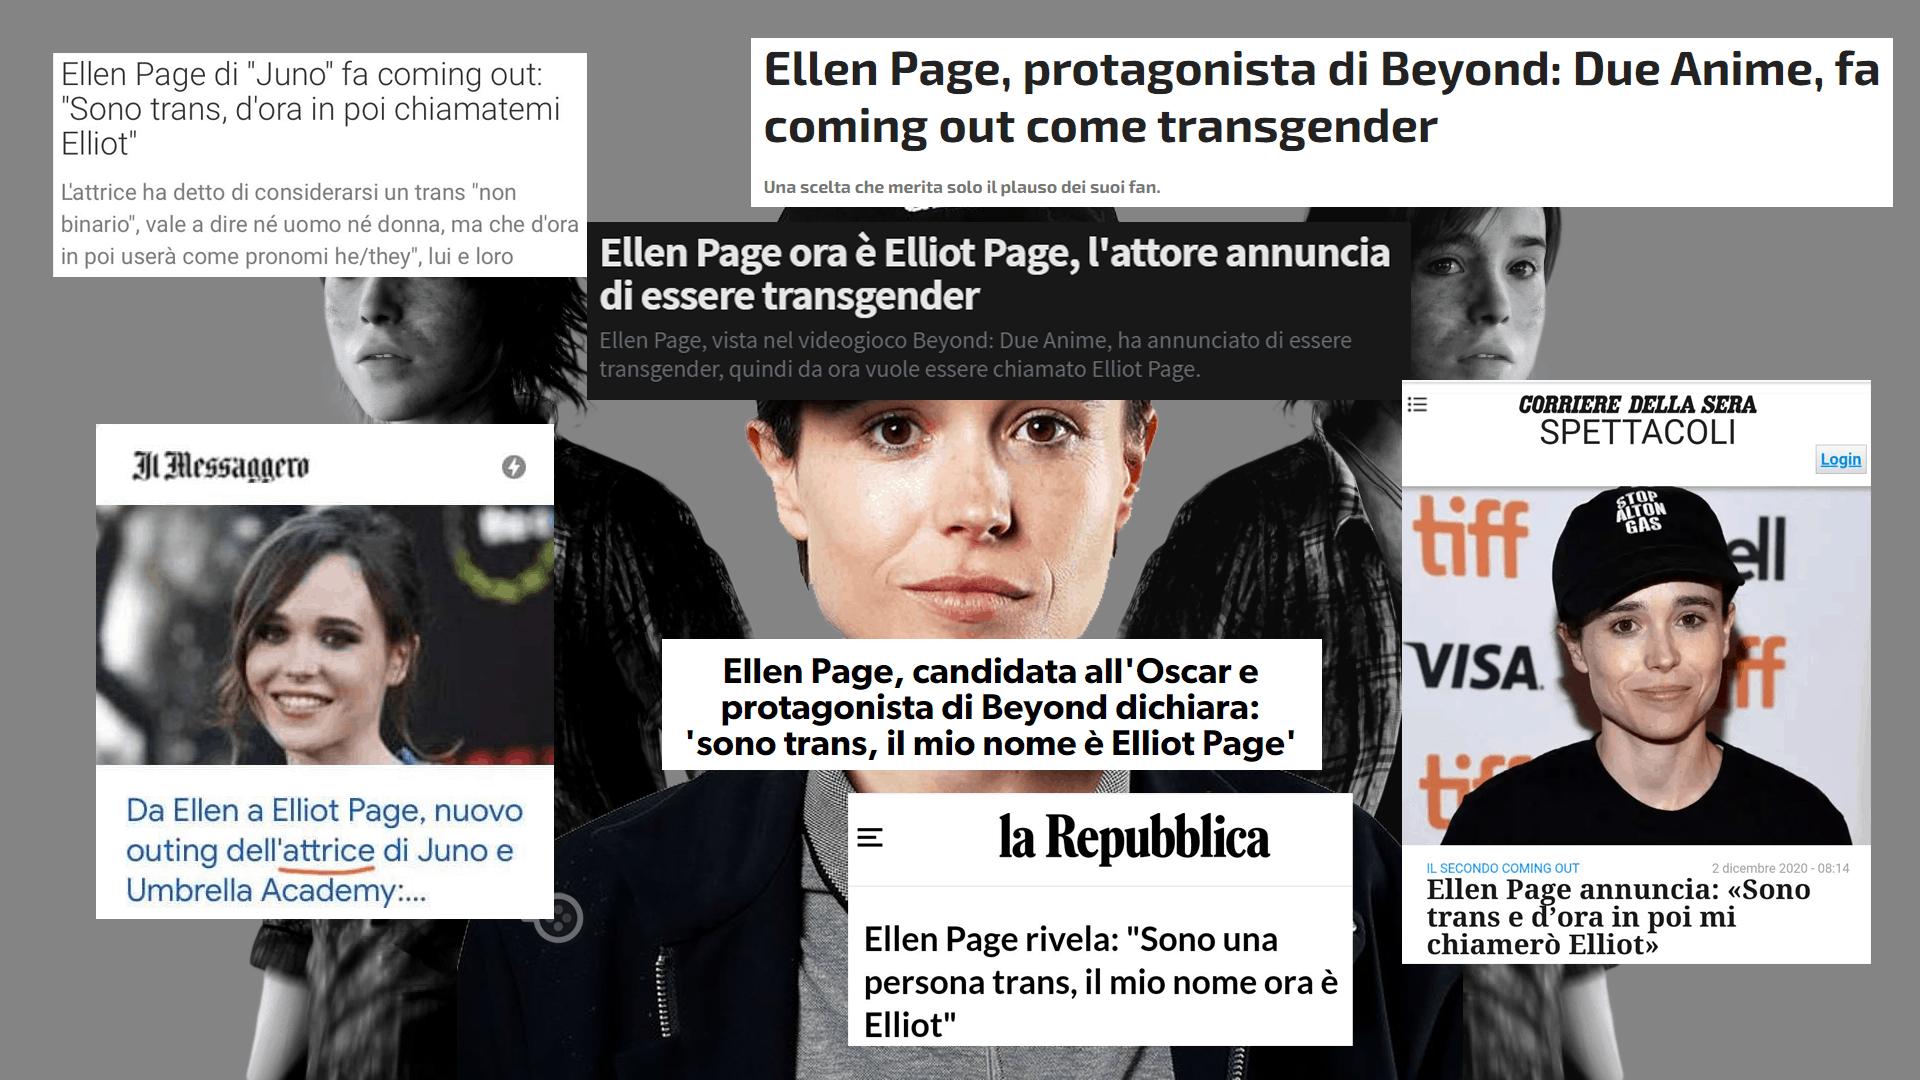 Elliot Page